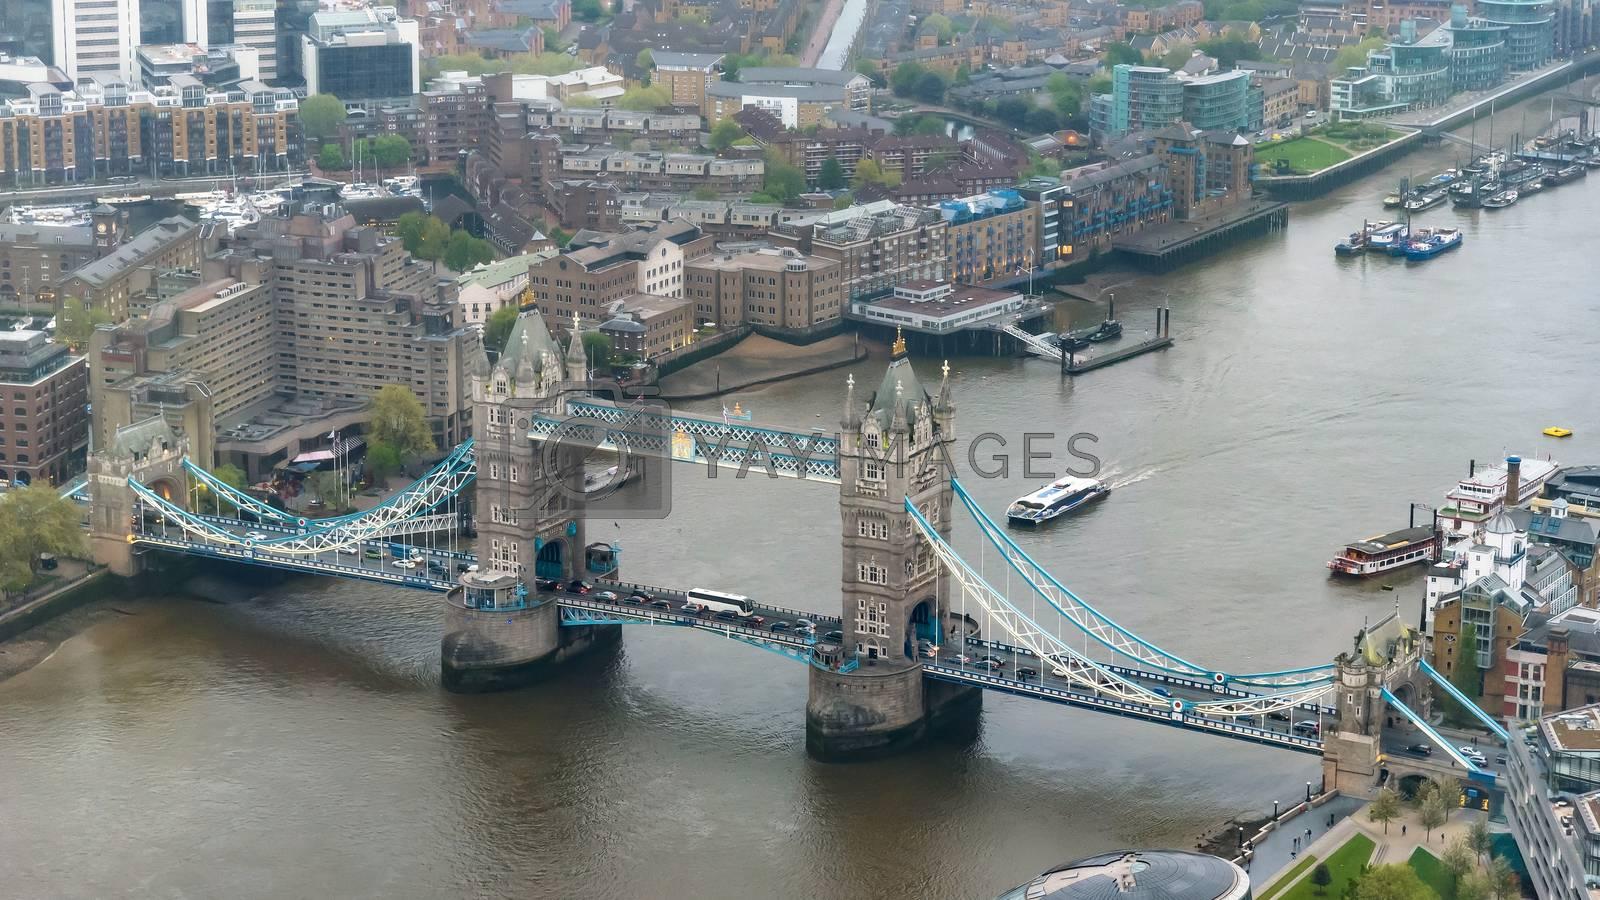 Royalty free image of Aerial view of Tower Bridge in London by mkos83